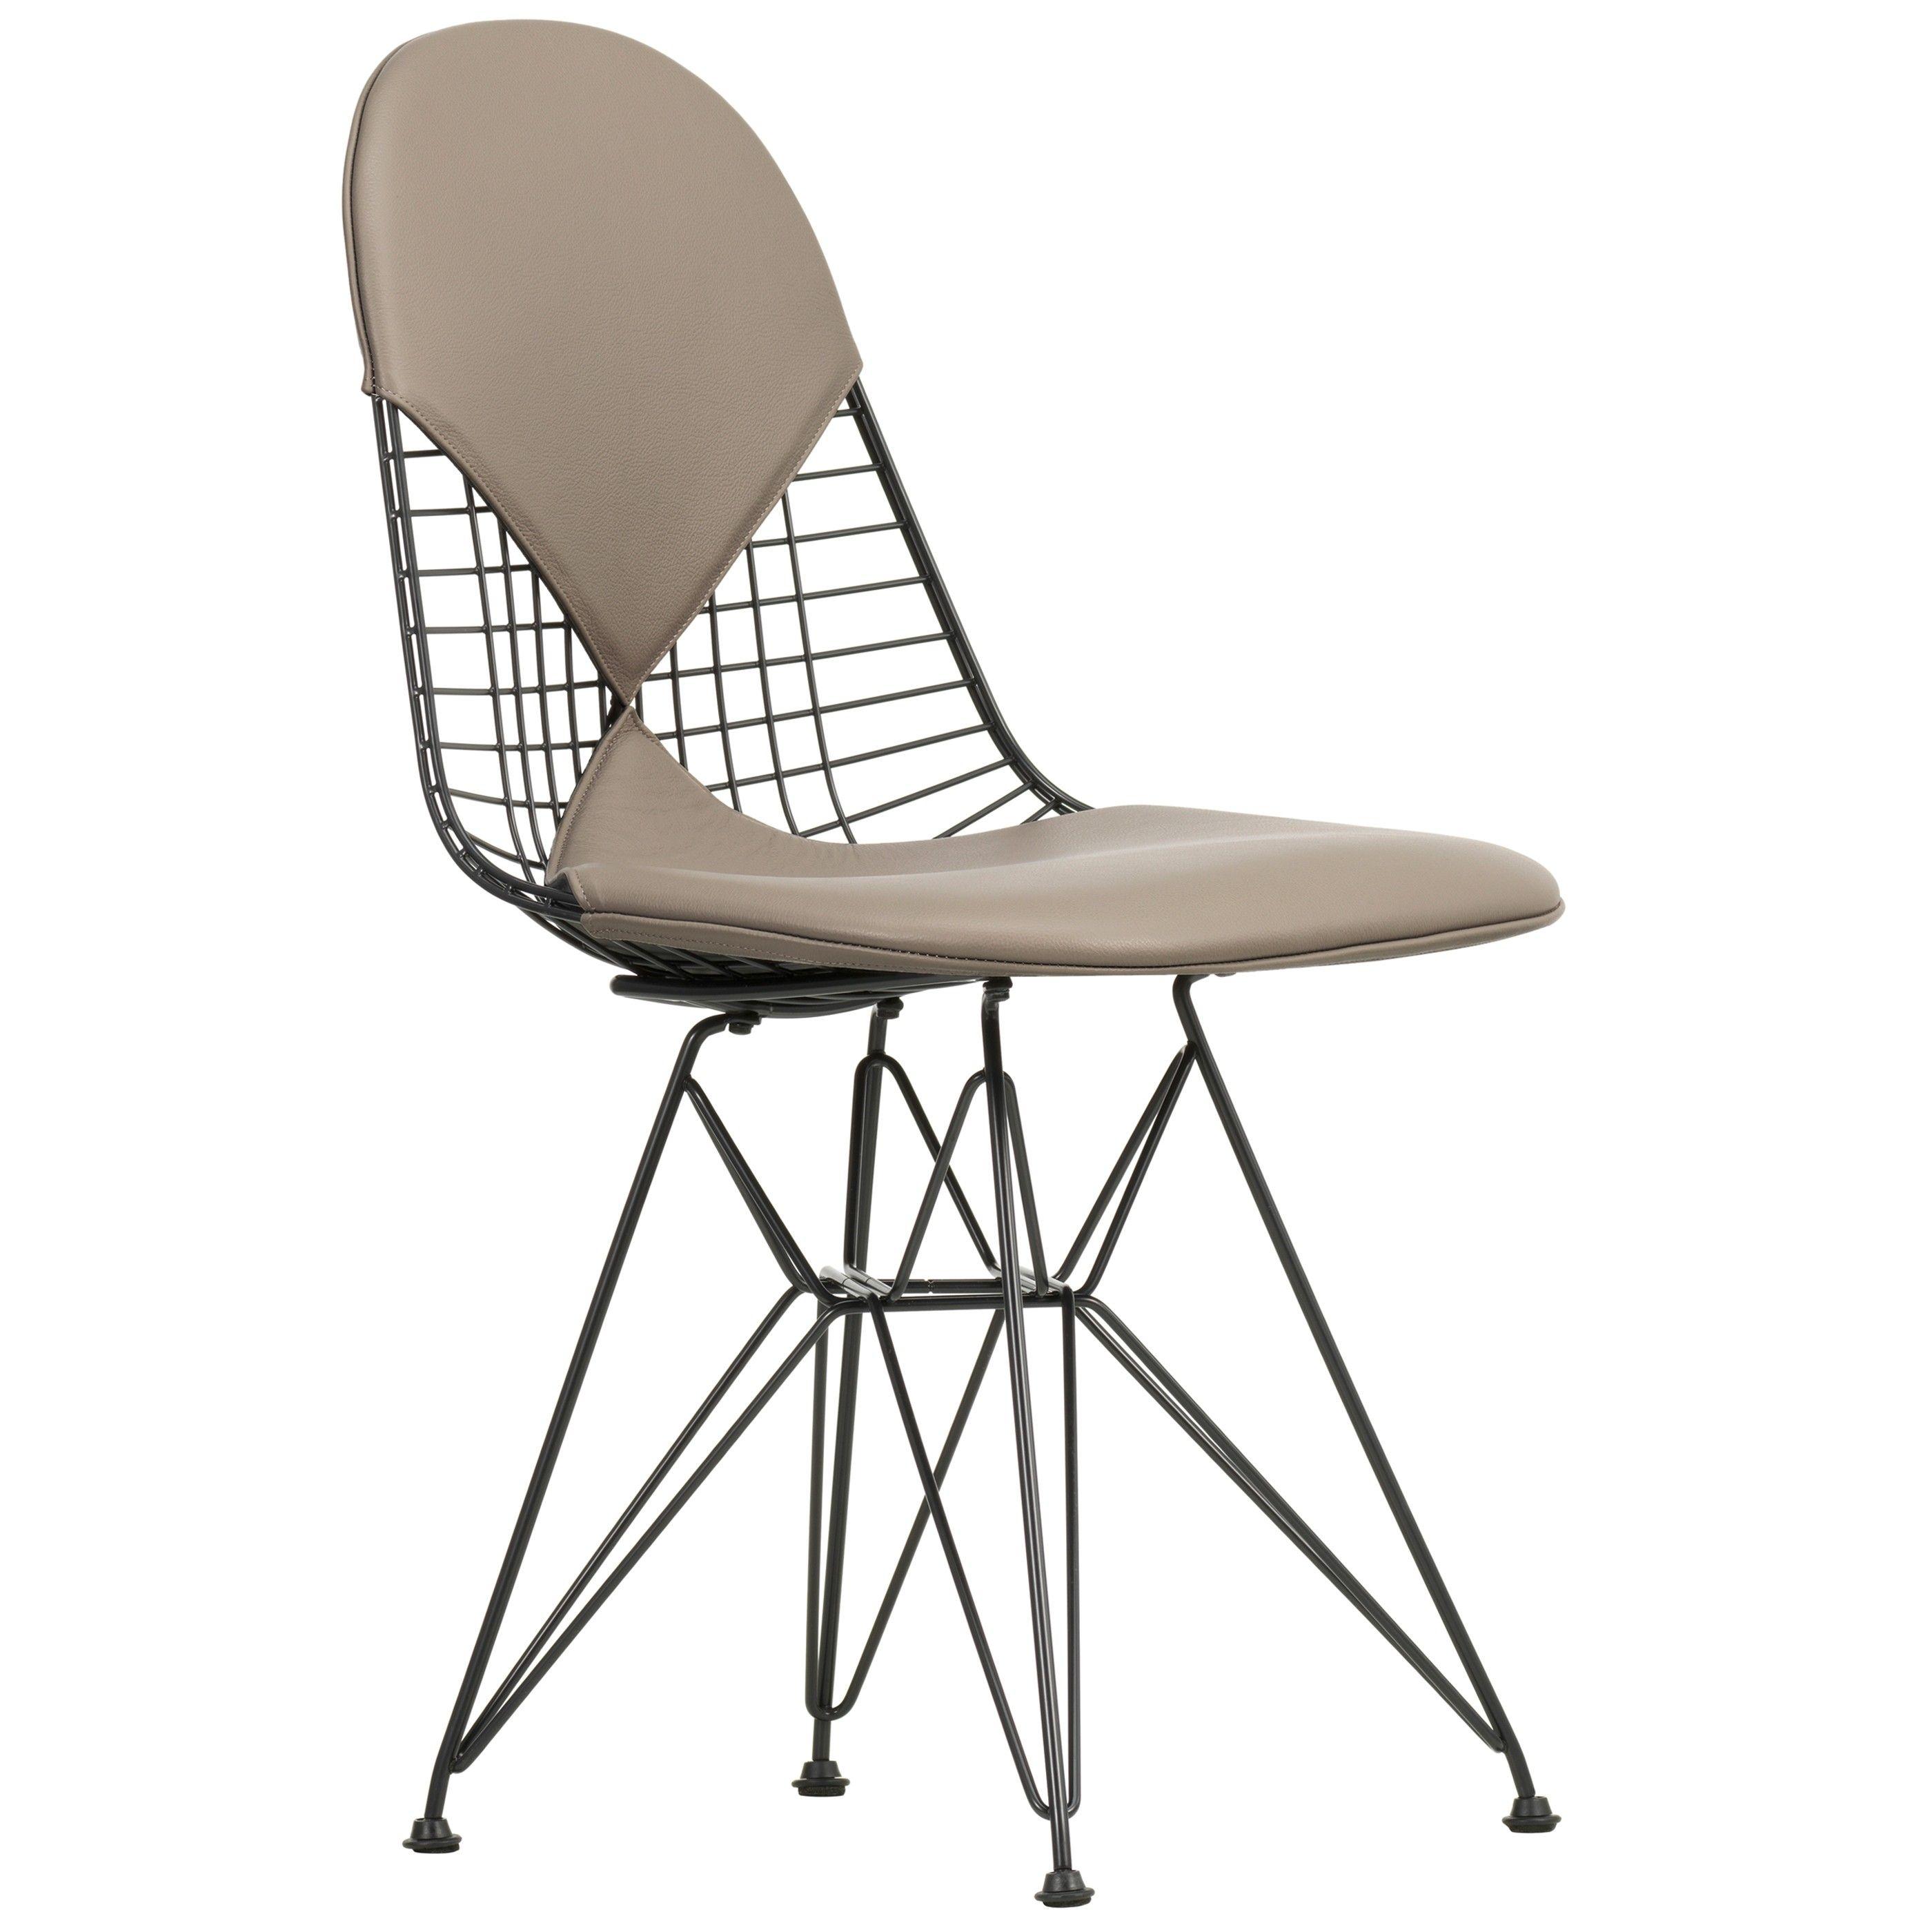 Vitra Design Stoelen.Vitra Eames Wire Chair Dkr 2 Stoel Gepoedercoat Onderstel